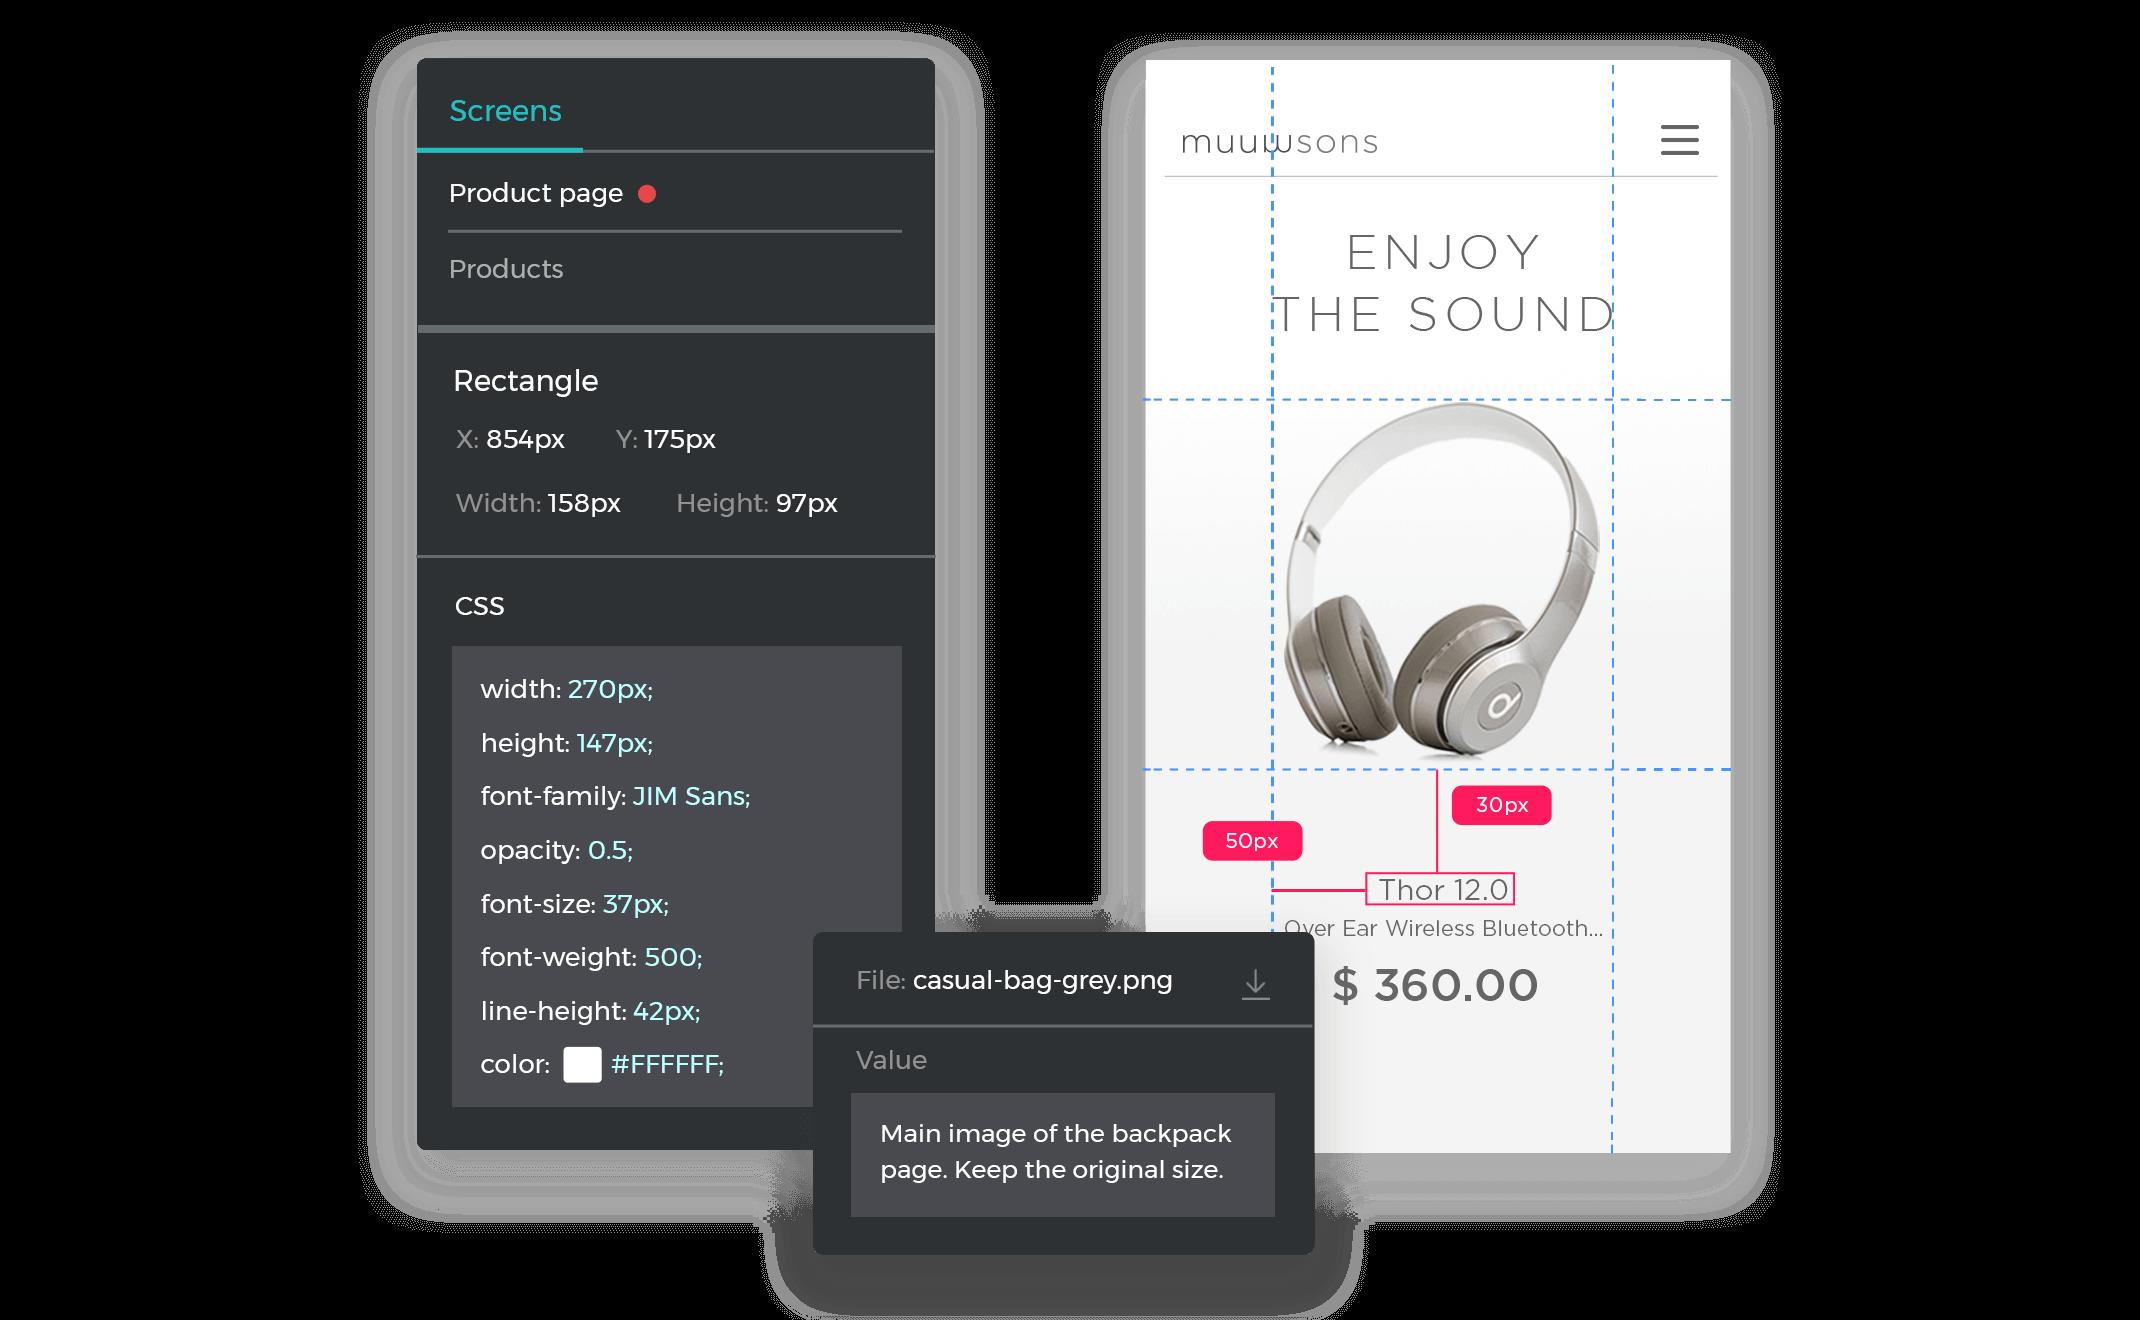 Justinmind's developer interface with redlines